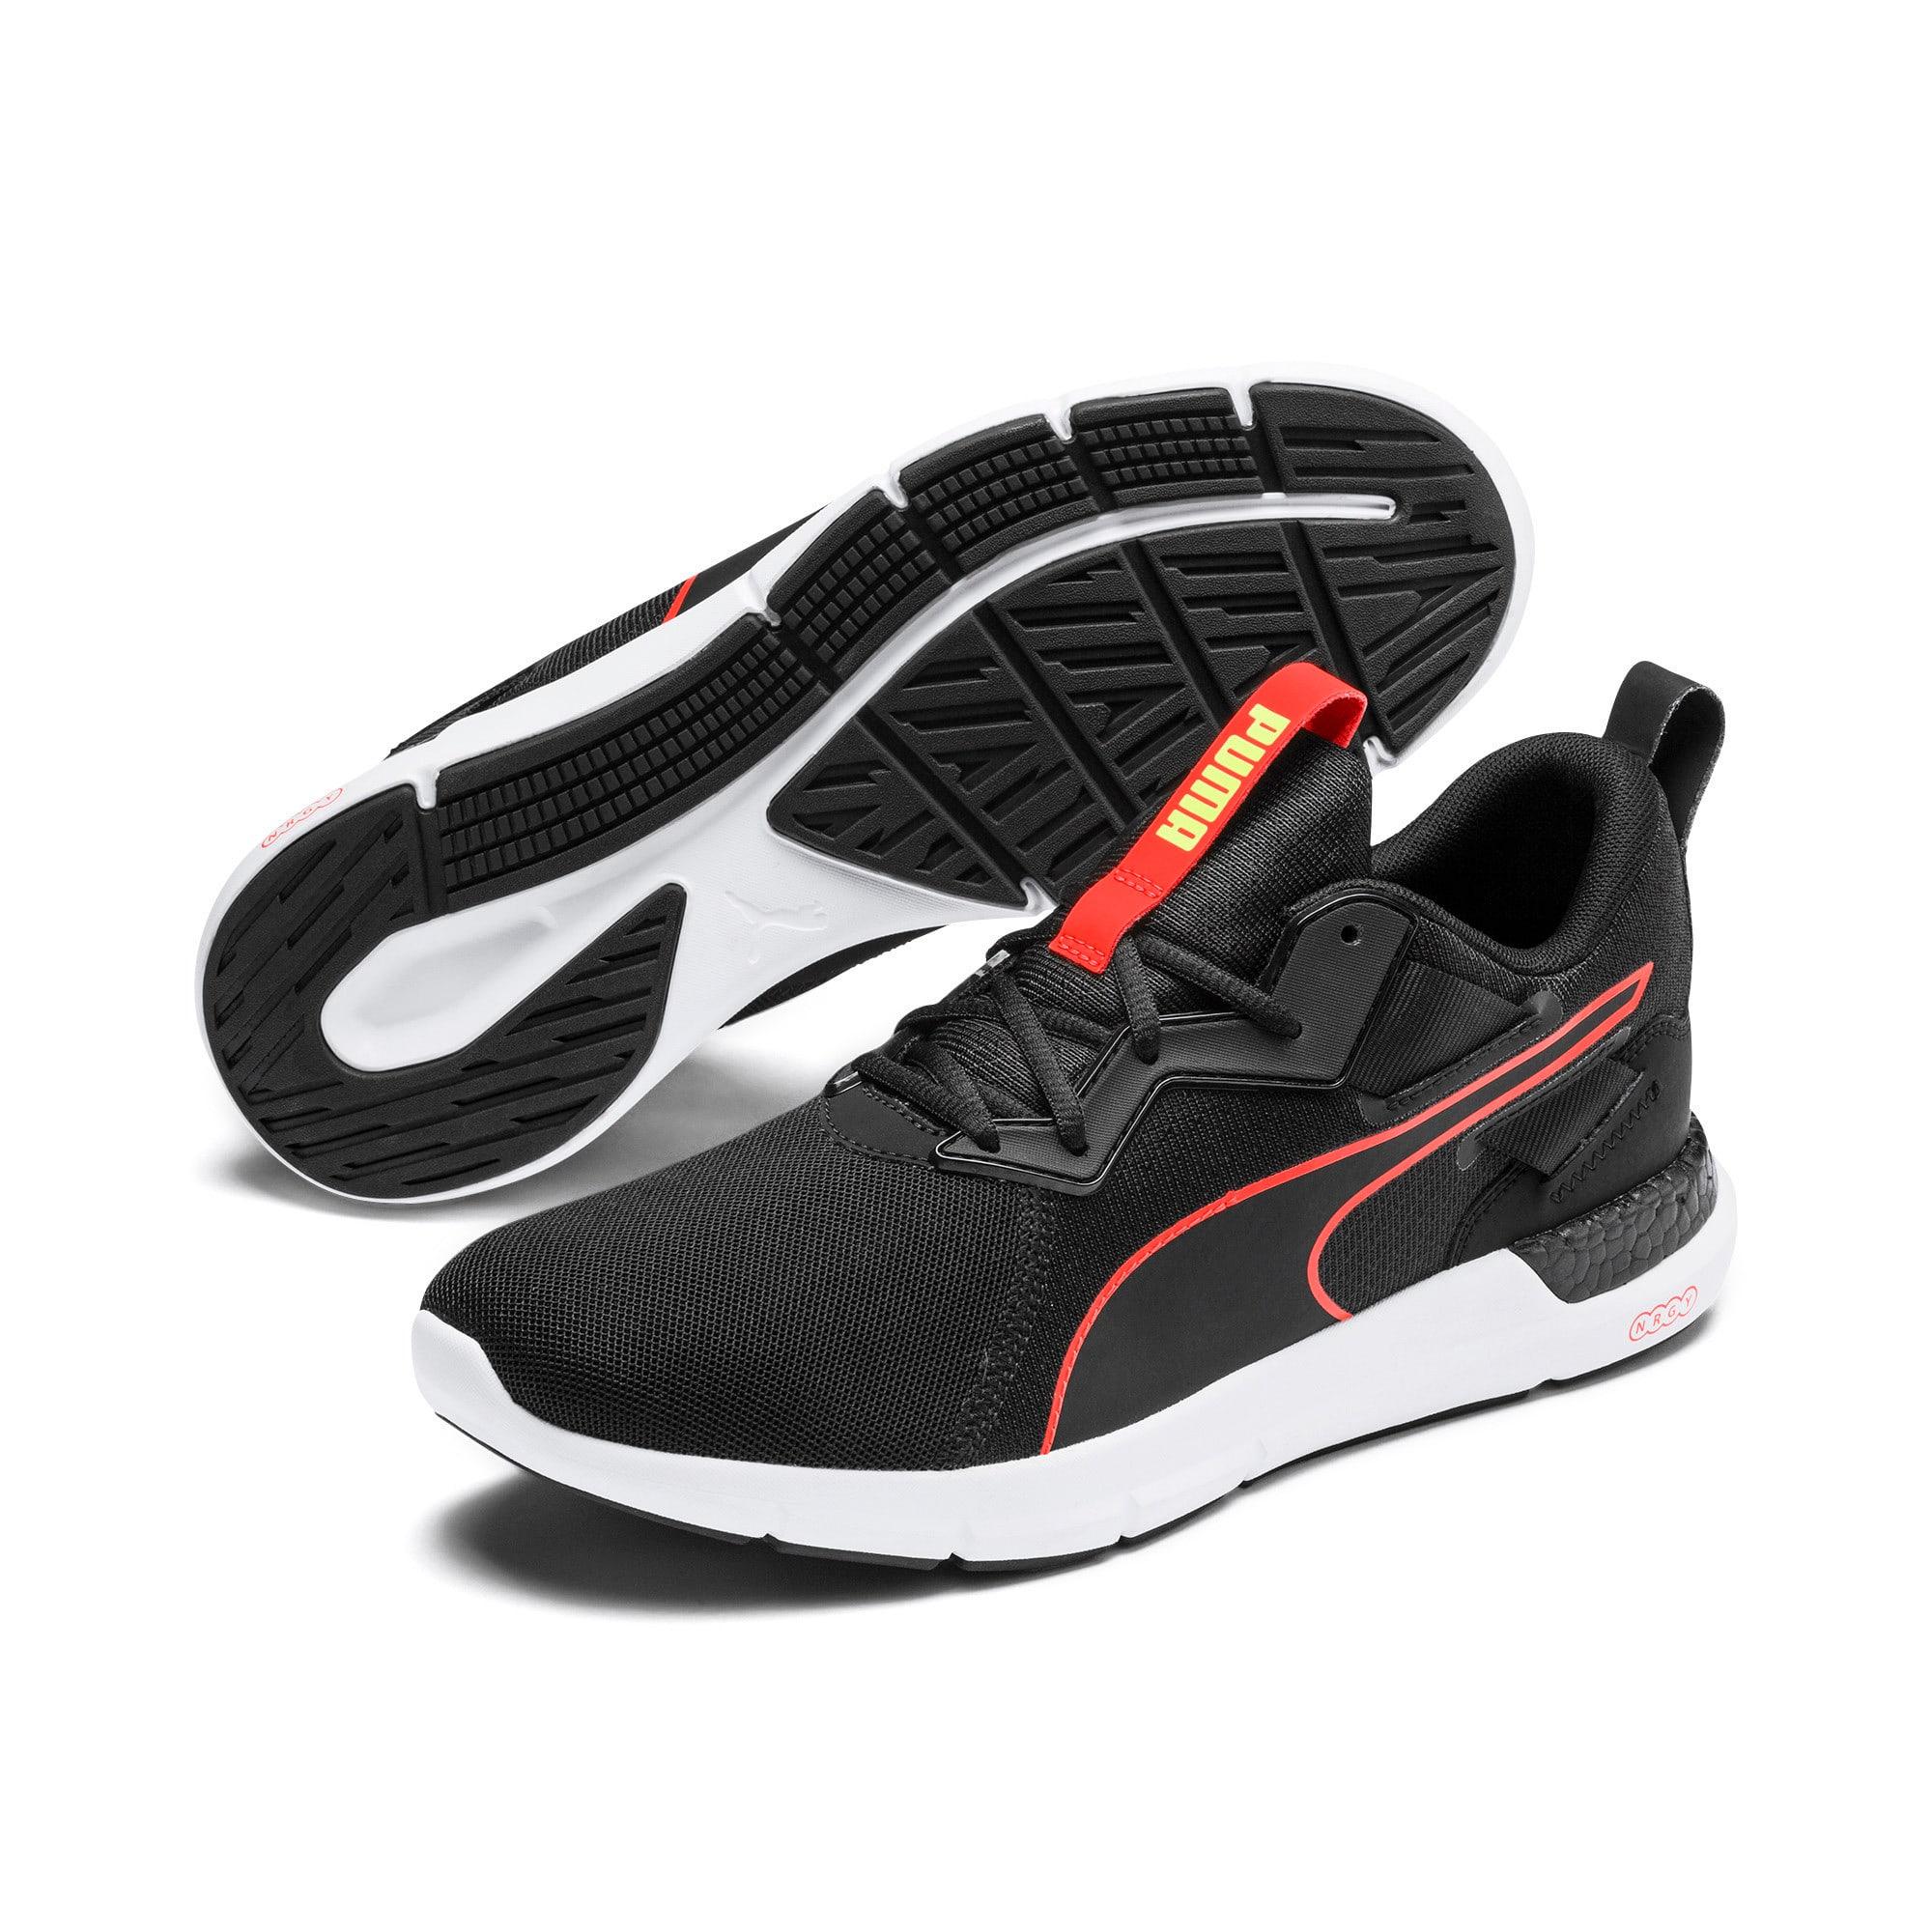 Thumbnail 2 of NRGY Dynamo Futuro Men's Running Shoes, Puma Black-Nrgy Red, medium